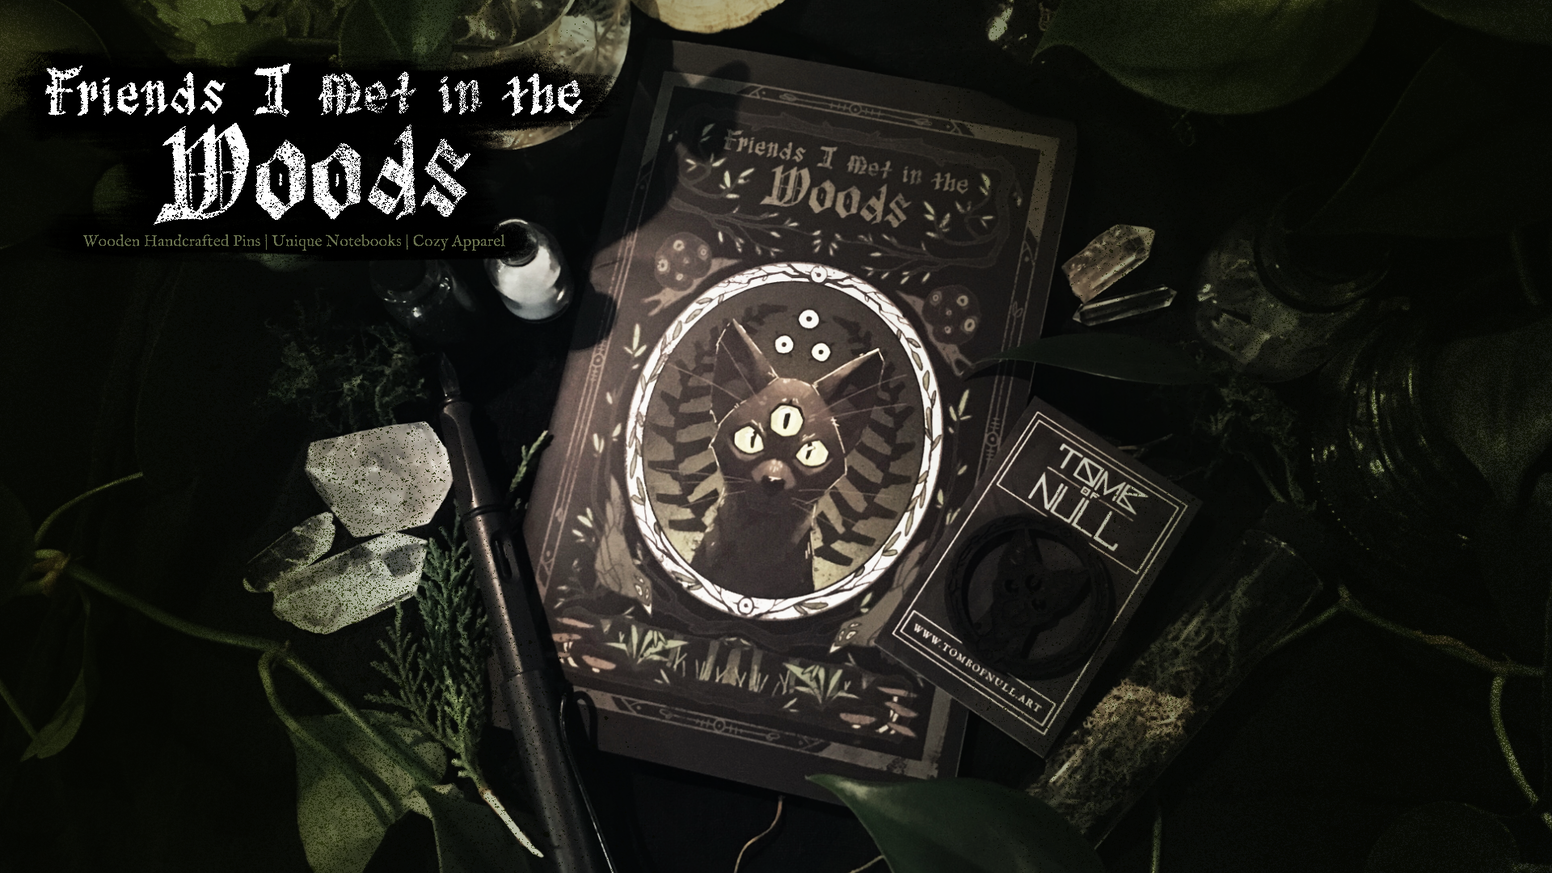 Artisan notebooks, handmade wooden pins, and apparel for the curious adventurer.